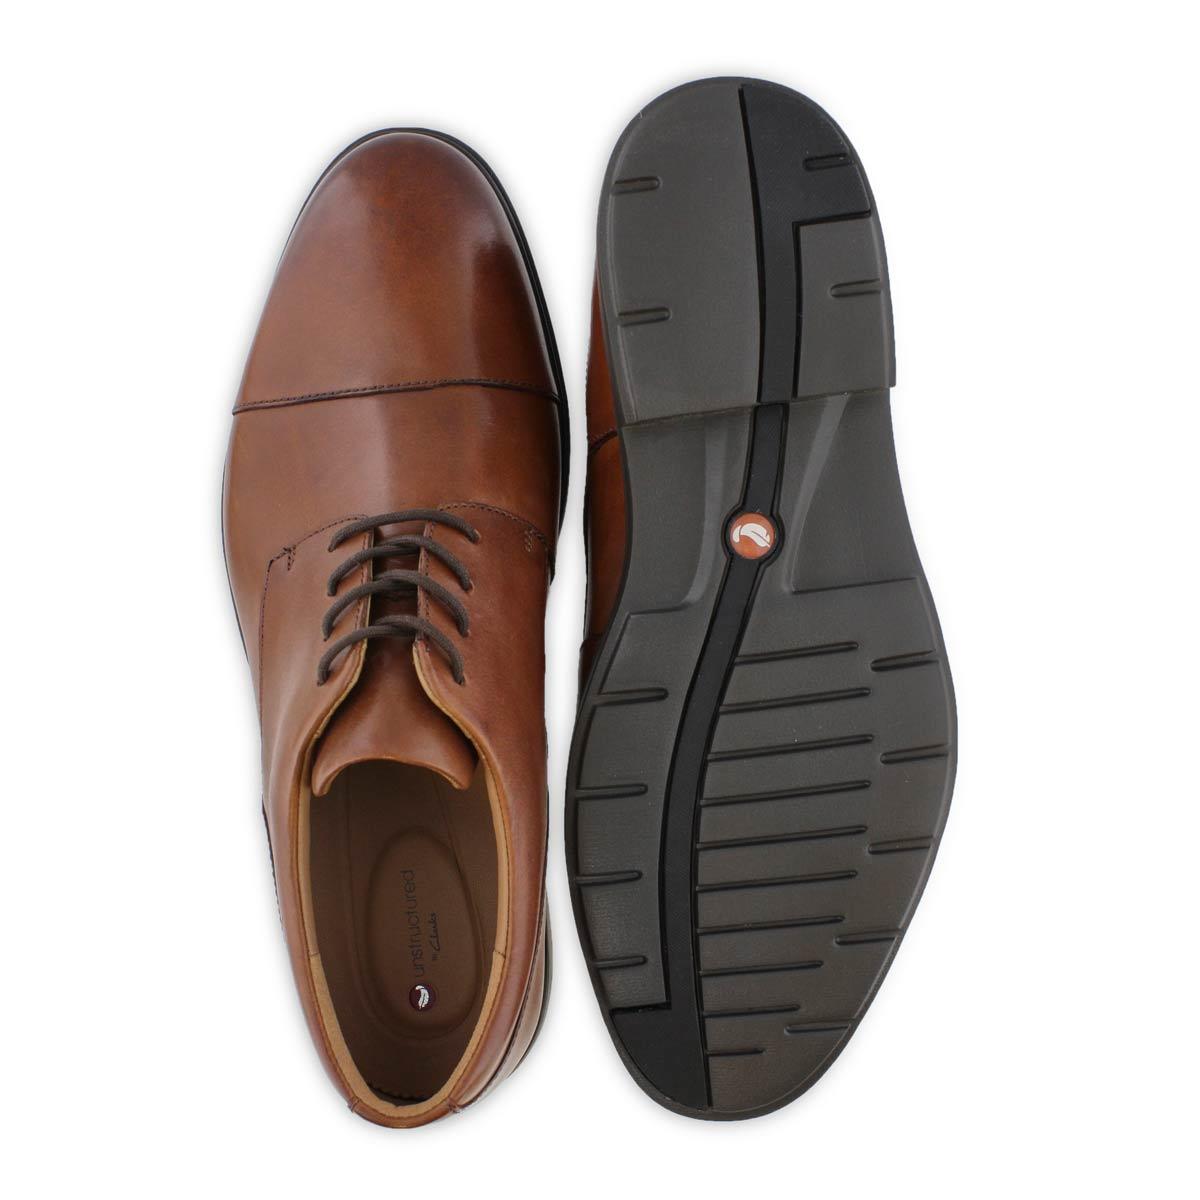 Men's Uun Tailor Cap Dress Wide Oxford - Tan